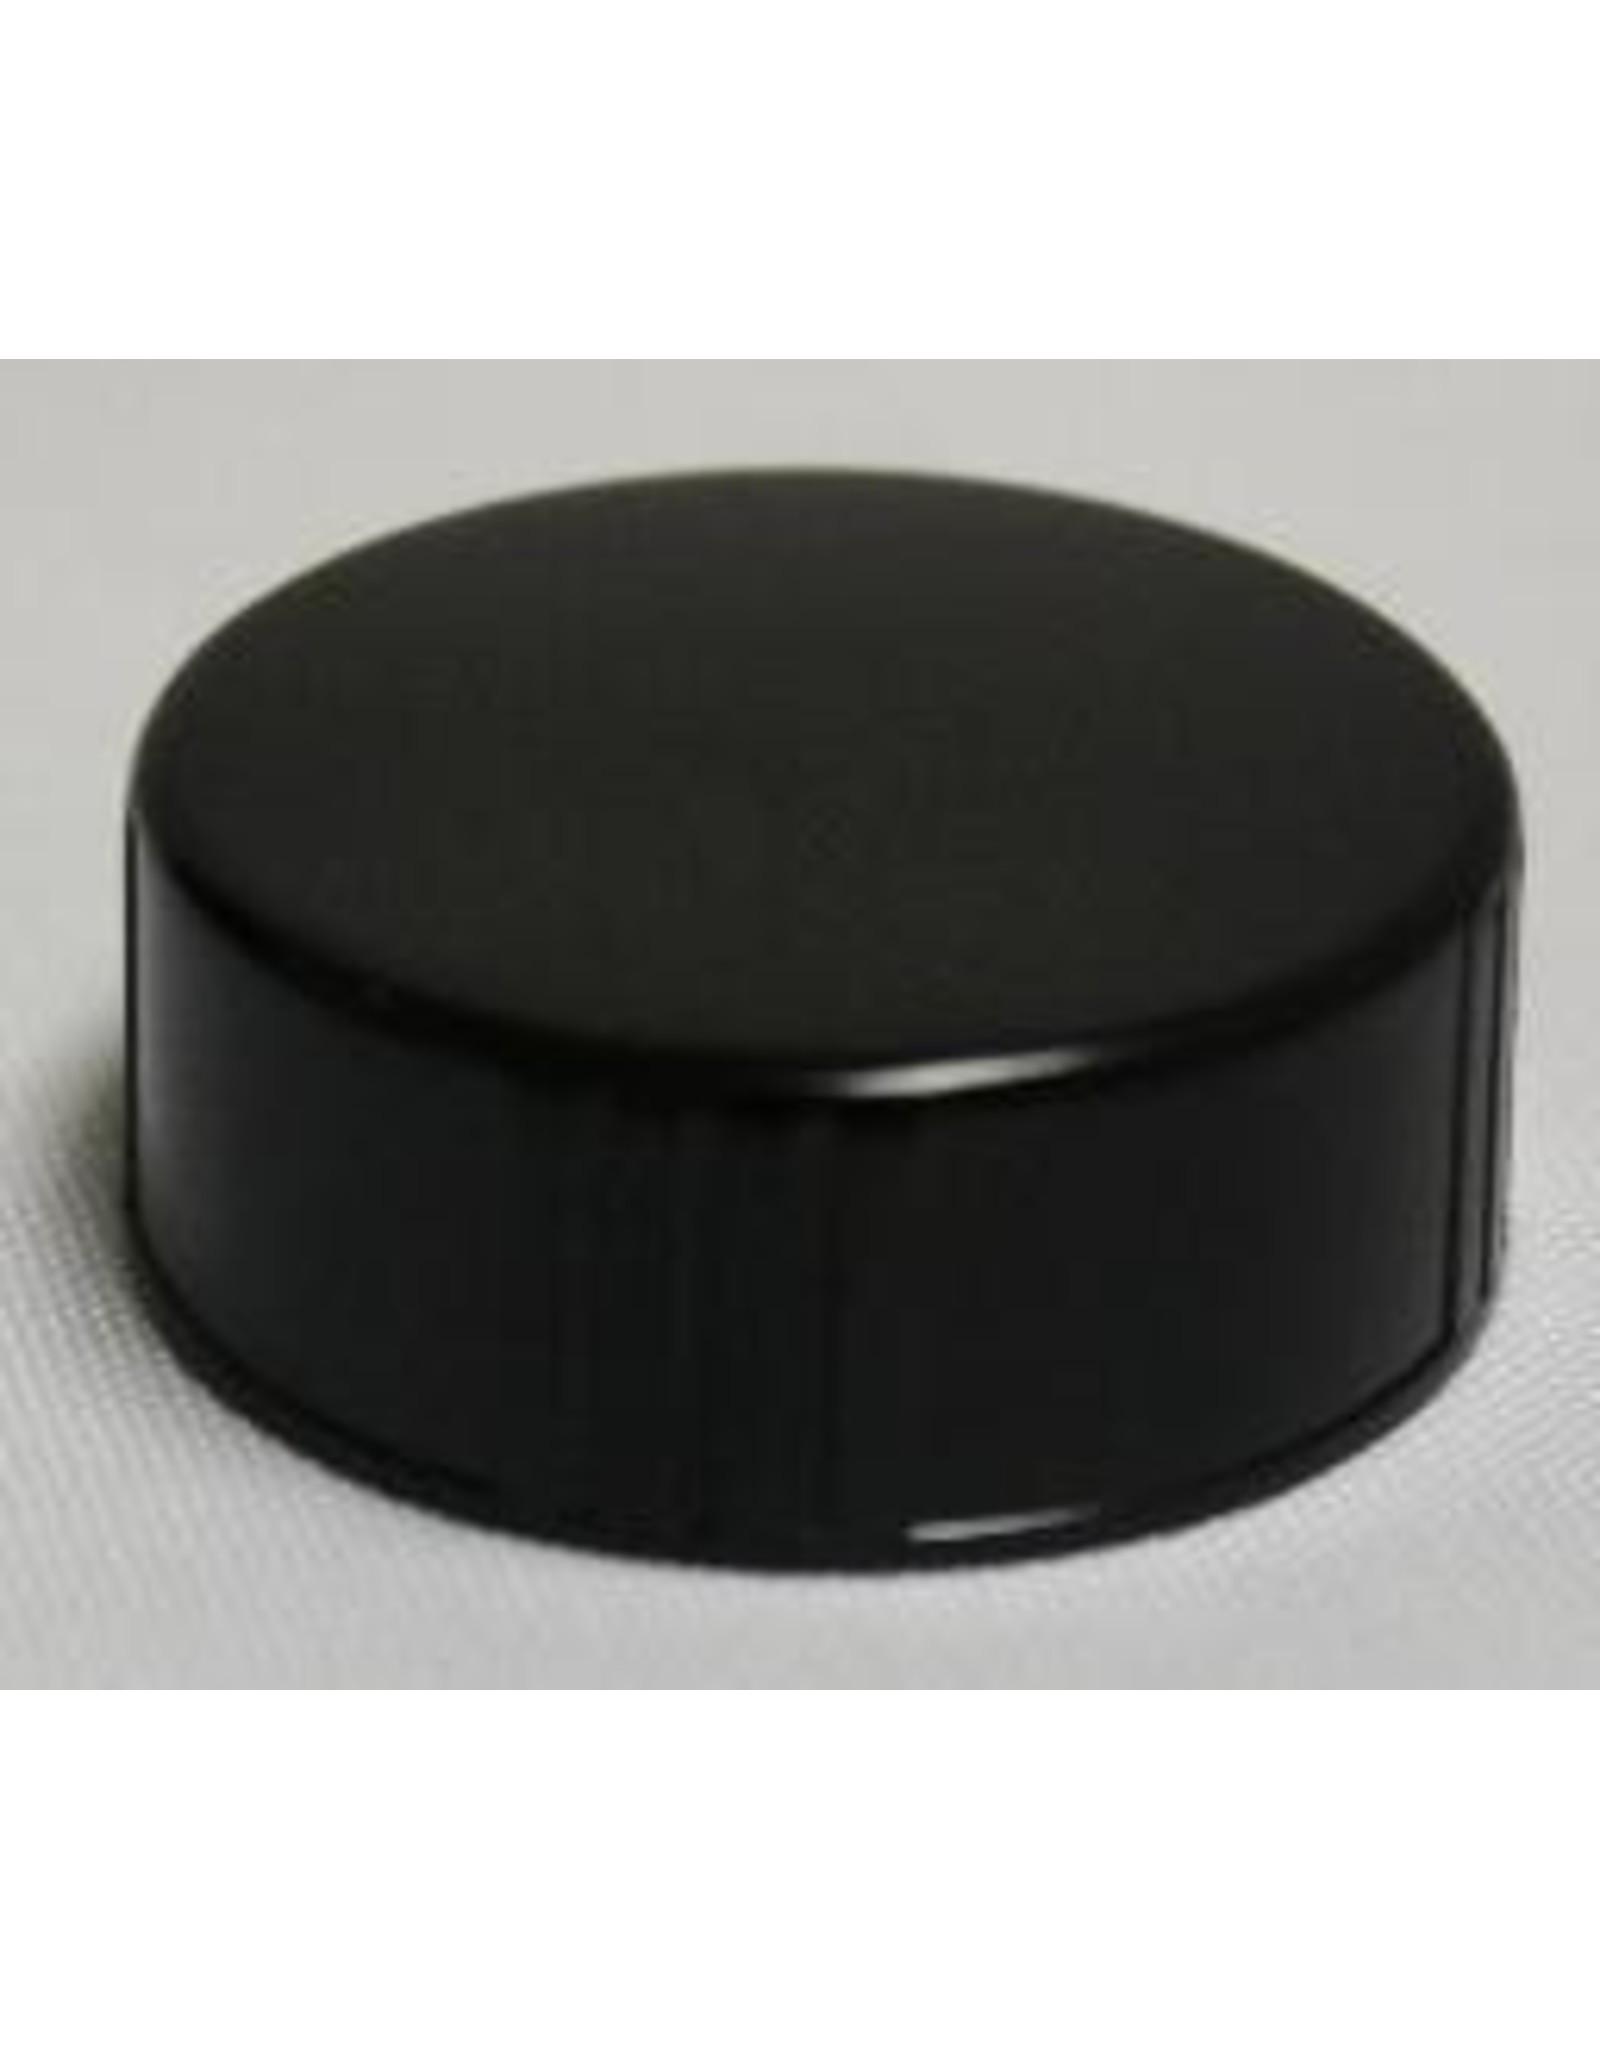 28mm Polyseal Screw Cap (Single)